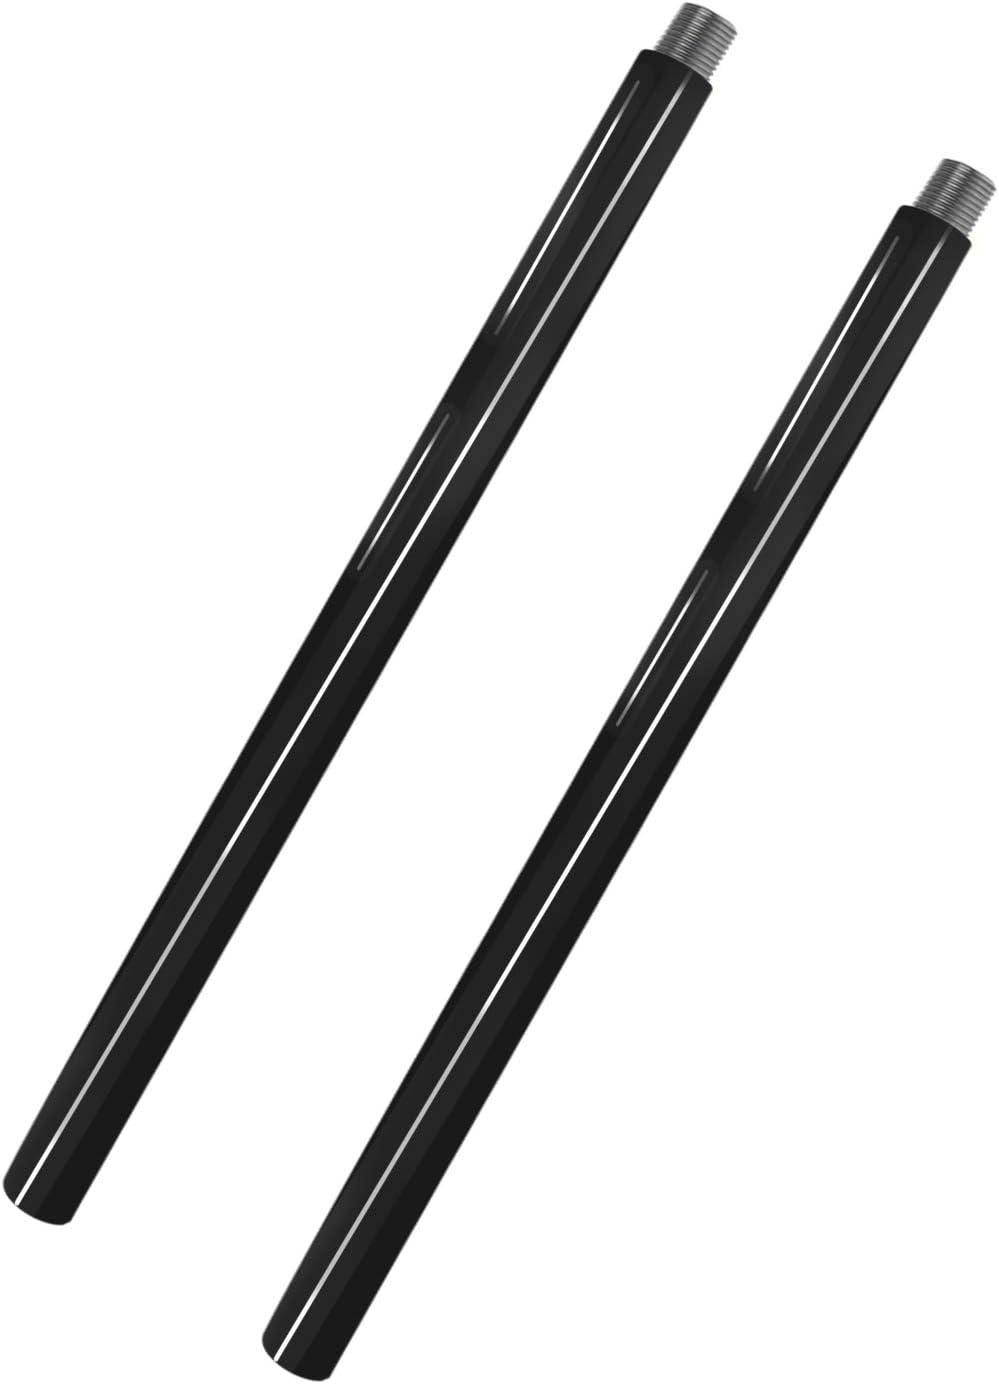 Artigarden Cheap sale Outdoor unisex Shepherd Hook Flexible 2 Pac Poles Extension